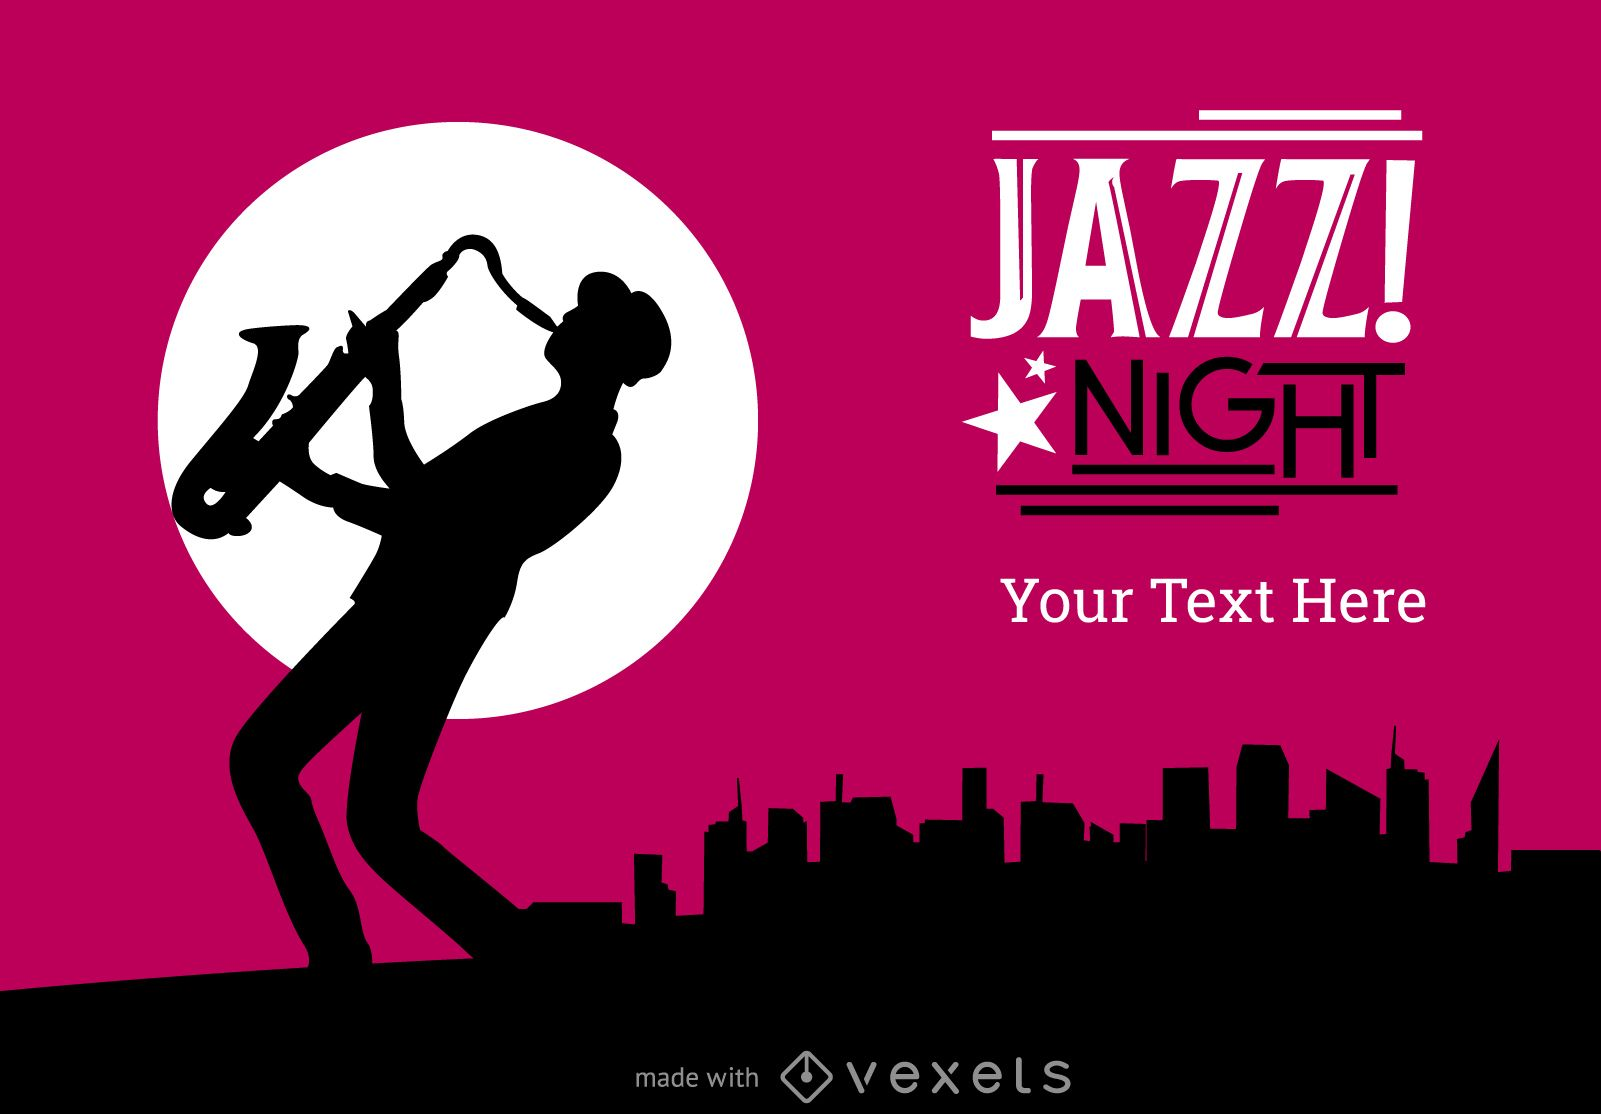 Jazz festival or concert poster maker